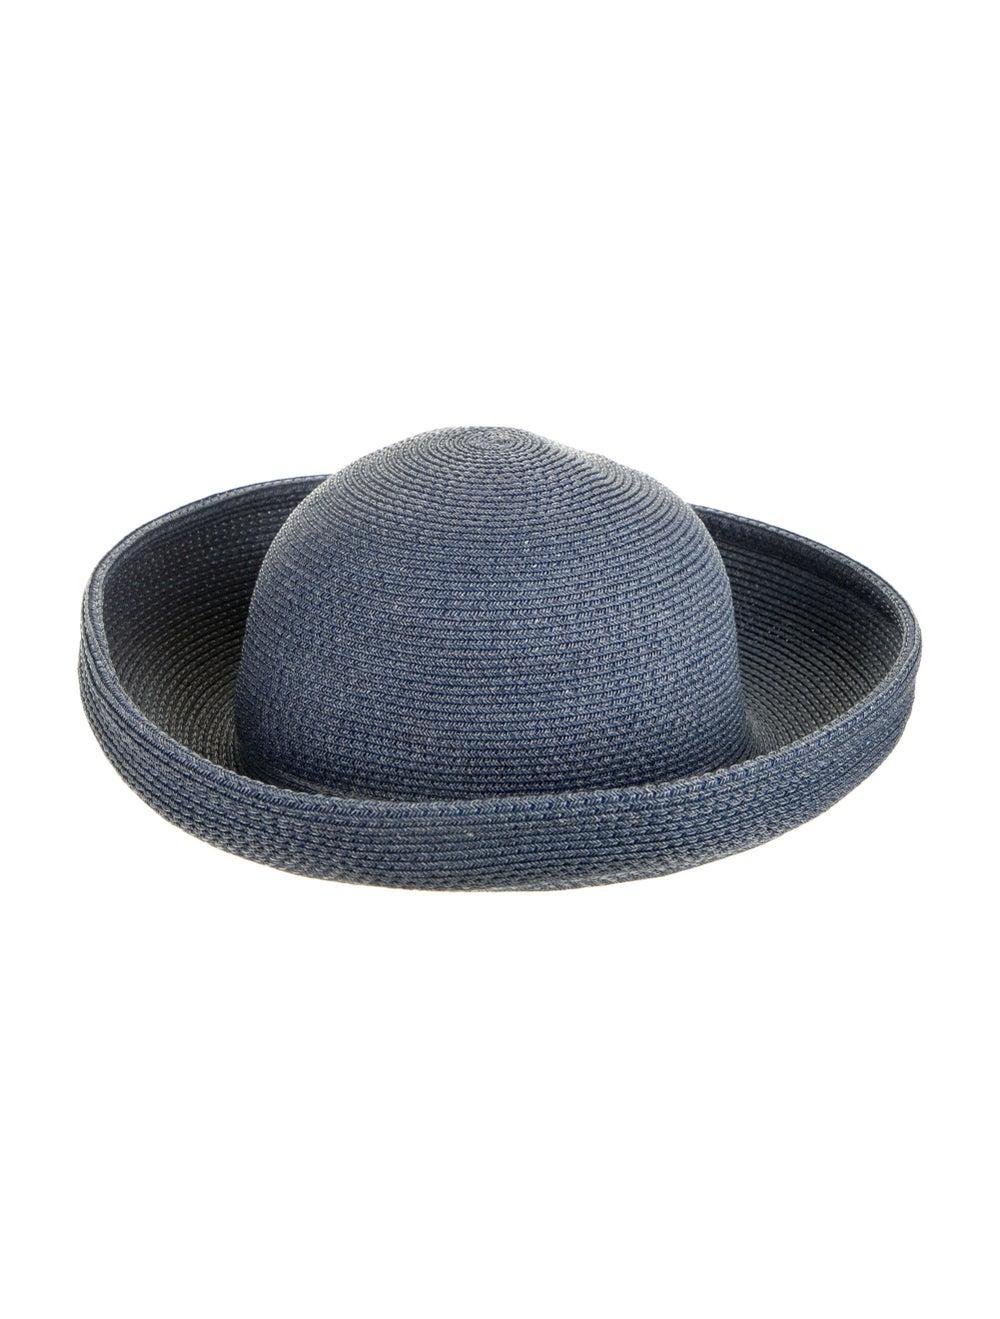 Eric Javits Wide Brim Hat Blue - image 2